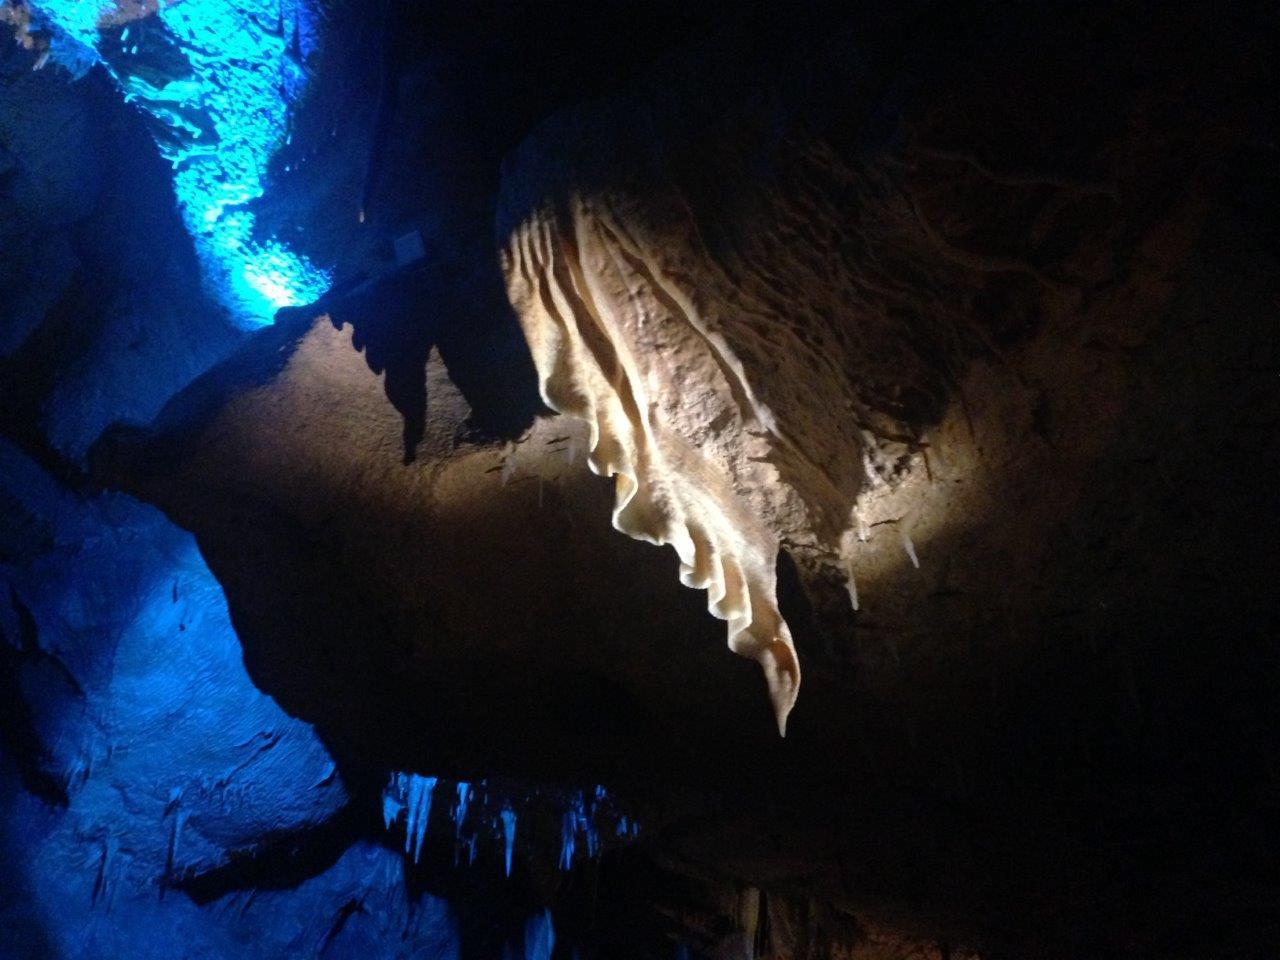 Grotte Tourtoirac - Semaine musicale de Tourtoirac